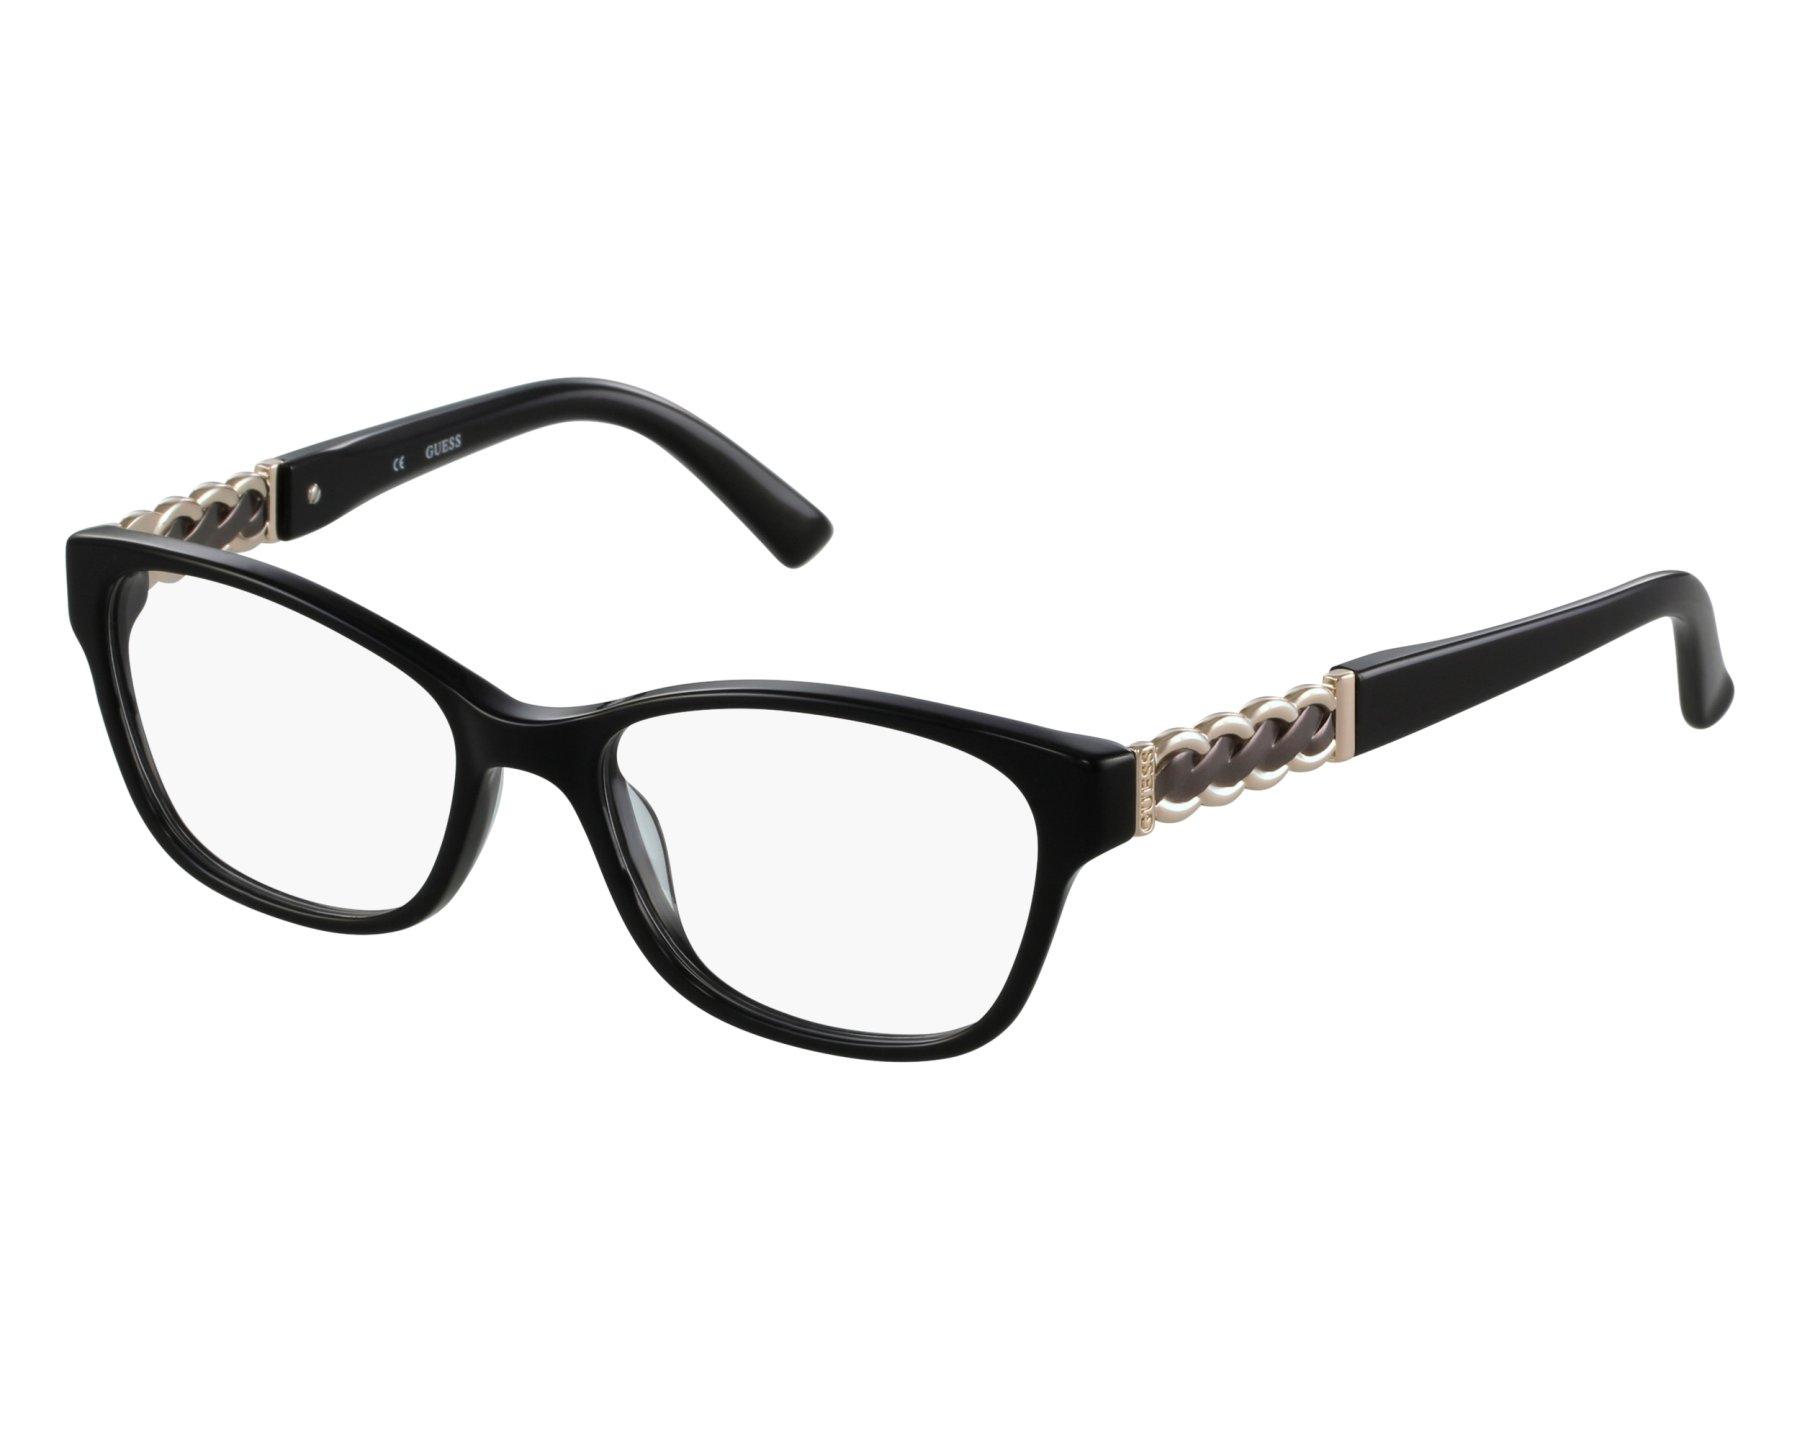 achat lunettes de vue guess gu 2382 blk visionet. Black Bedroom Furniture Sets. Home Design Ideas